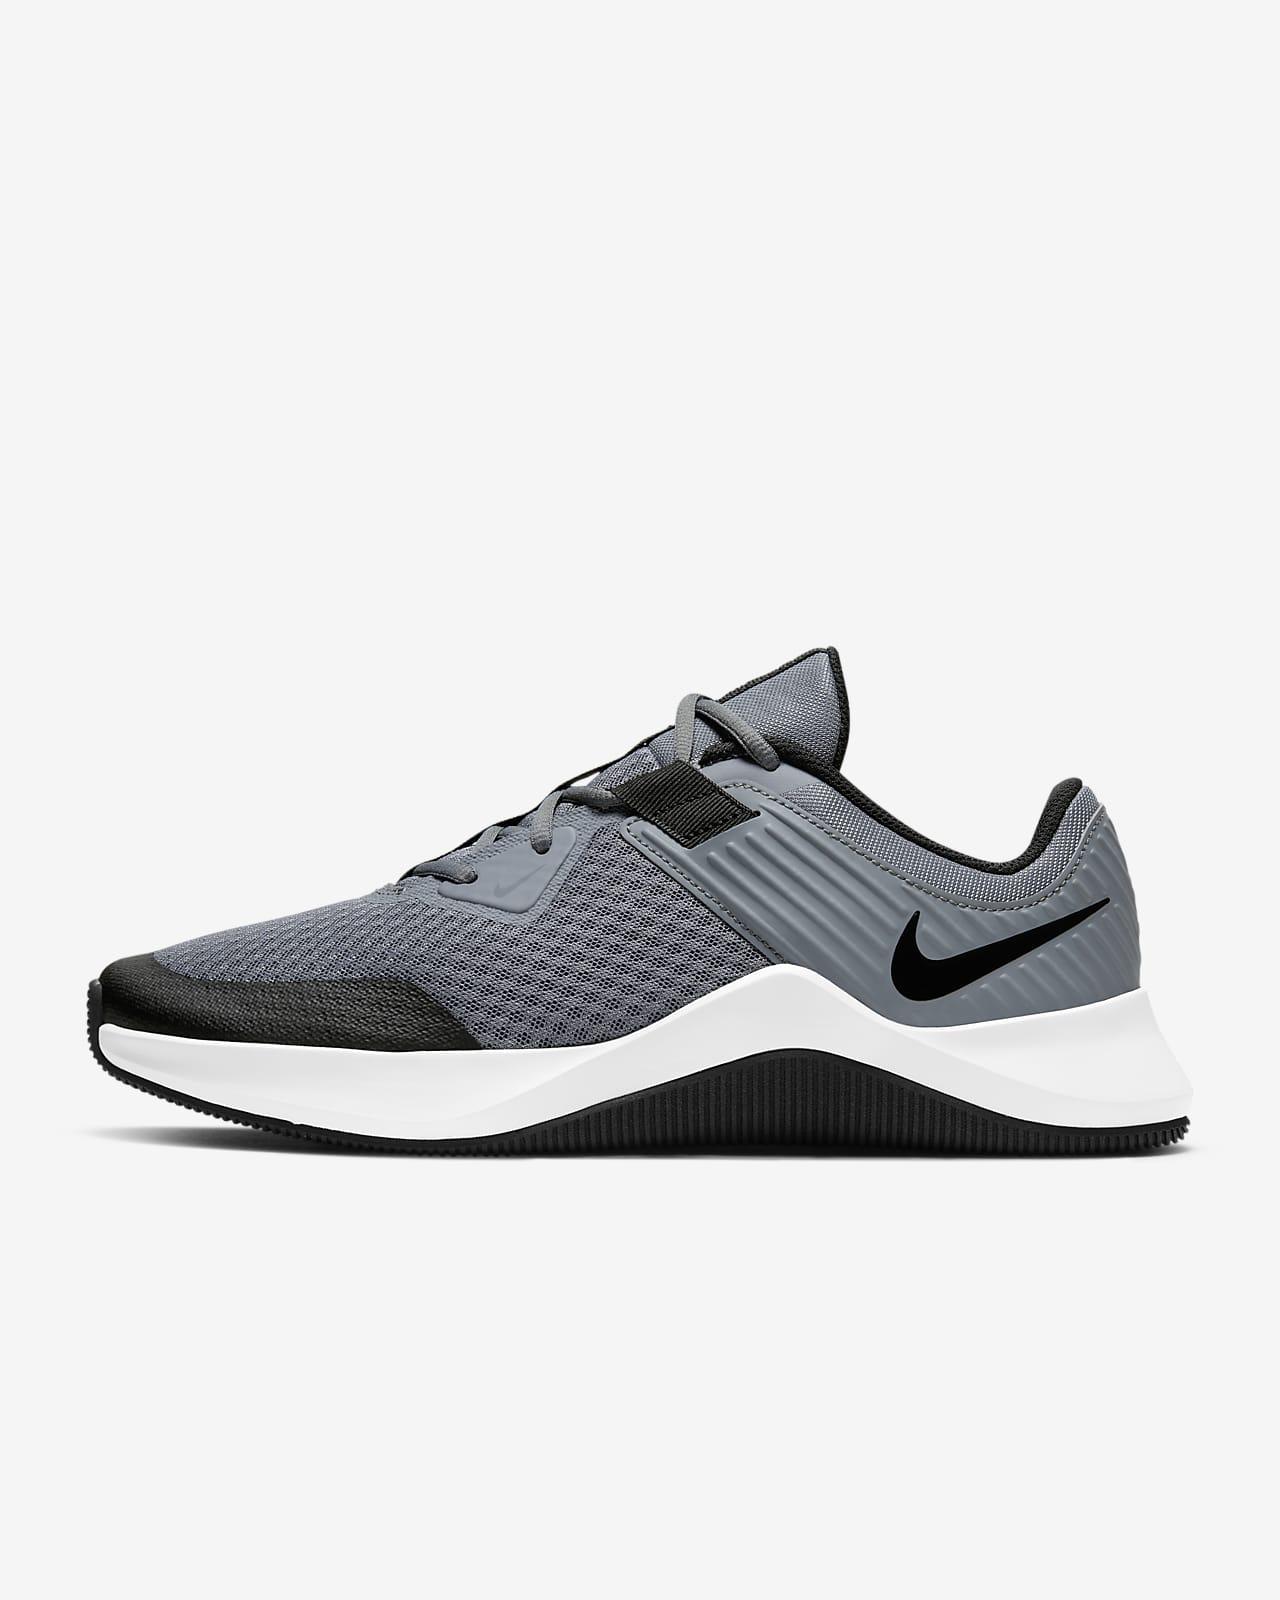 Nike MC Trainer Men's Training Shoes